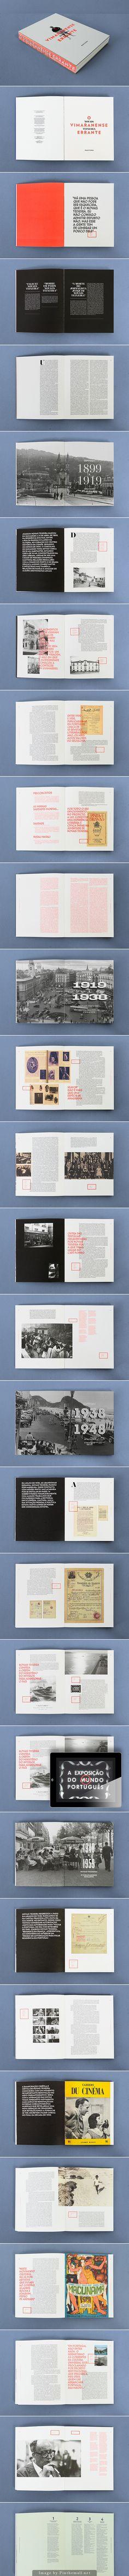 "Interactive printing Book ""O Vimaranense Errante"" - Atelier Martino & Jana #book #layout"